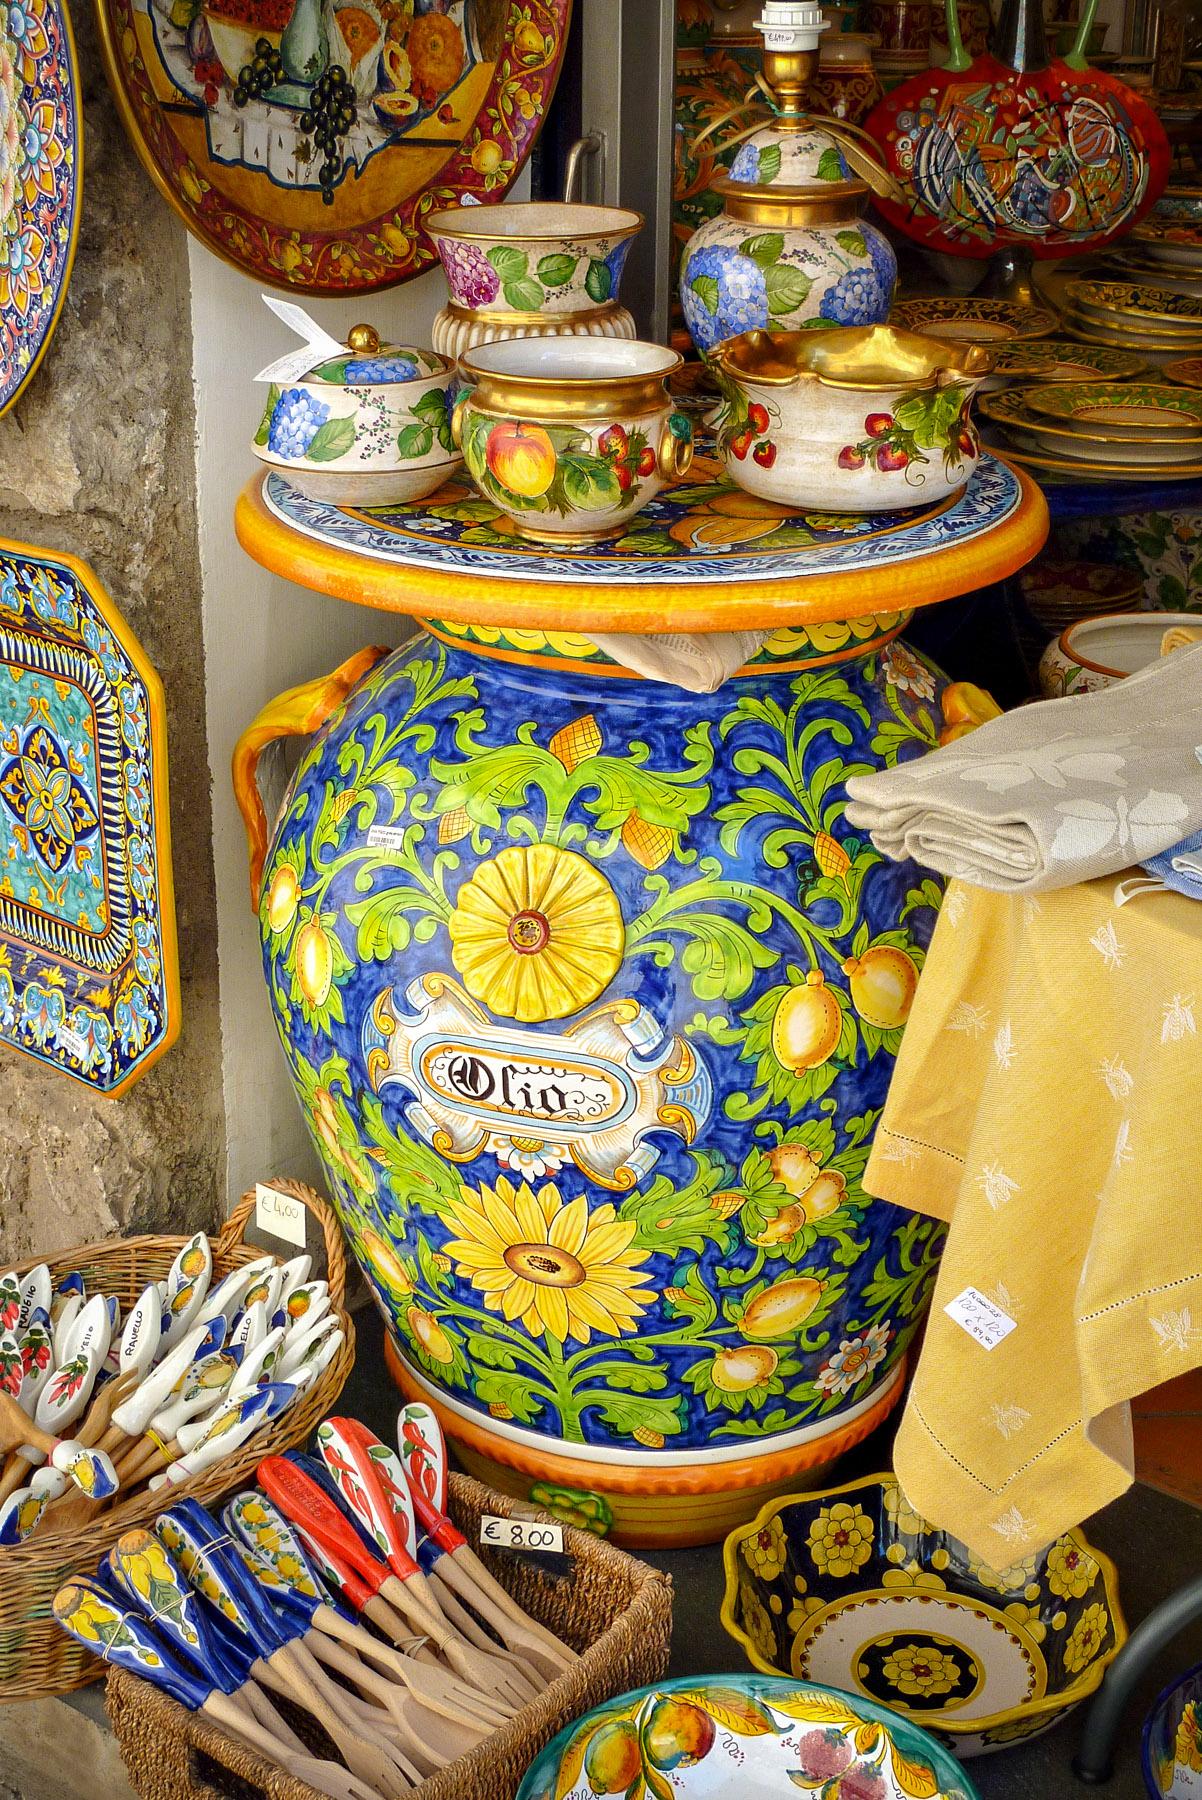 386_Italy2009.jpg